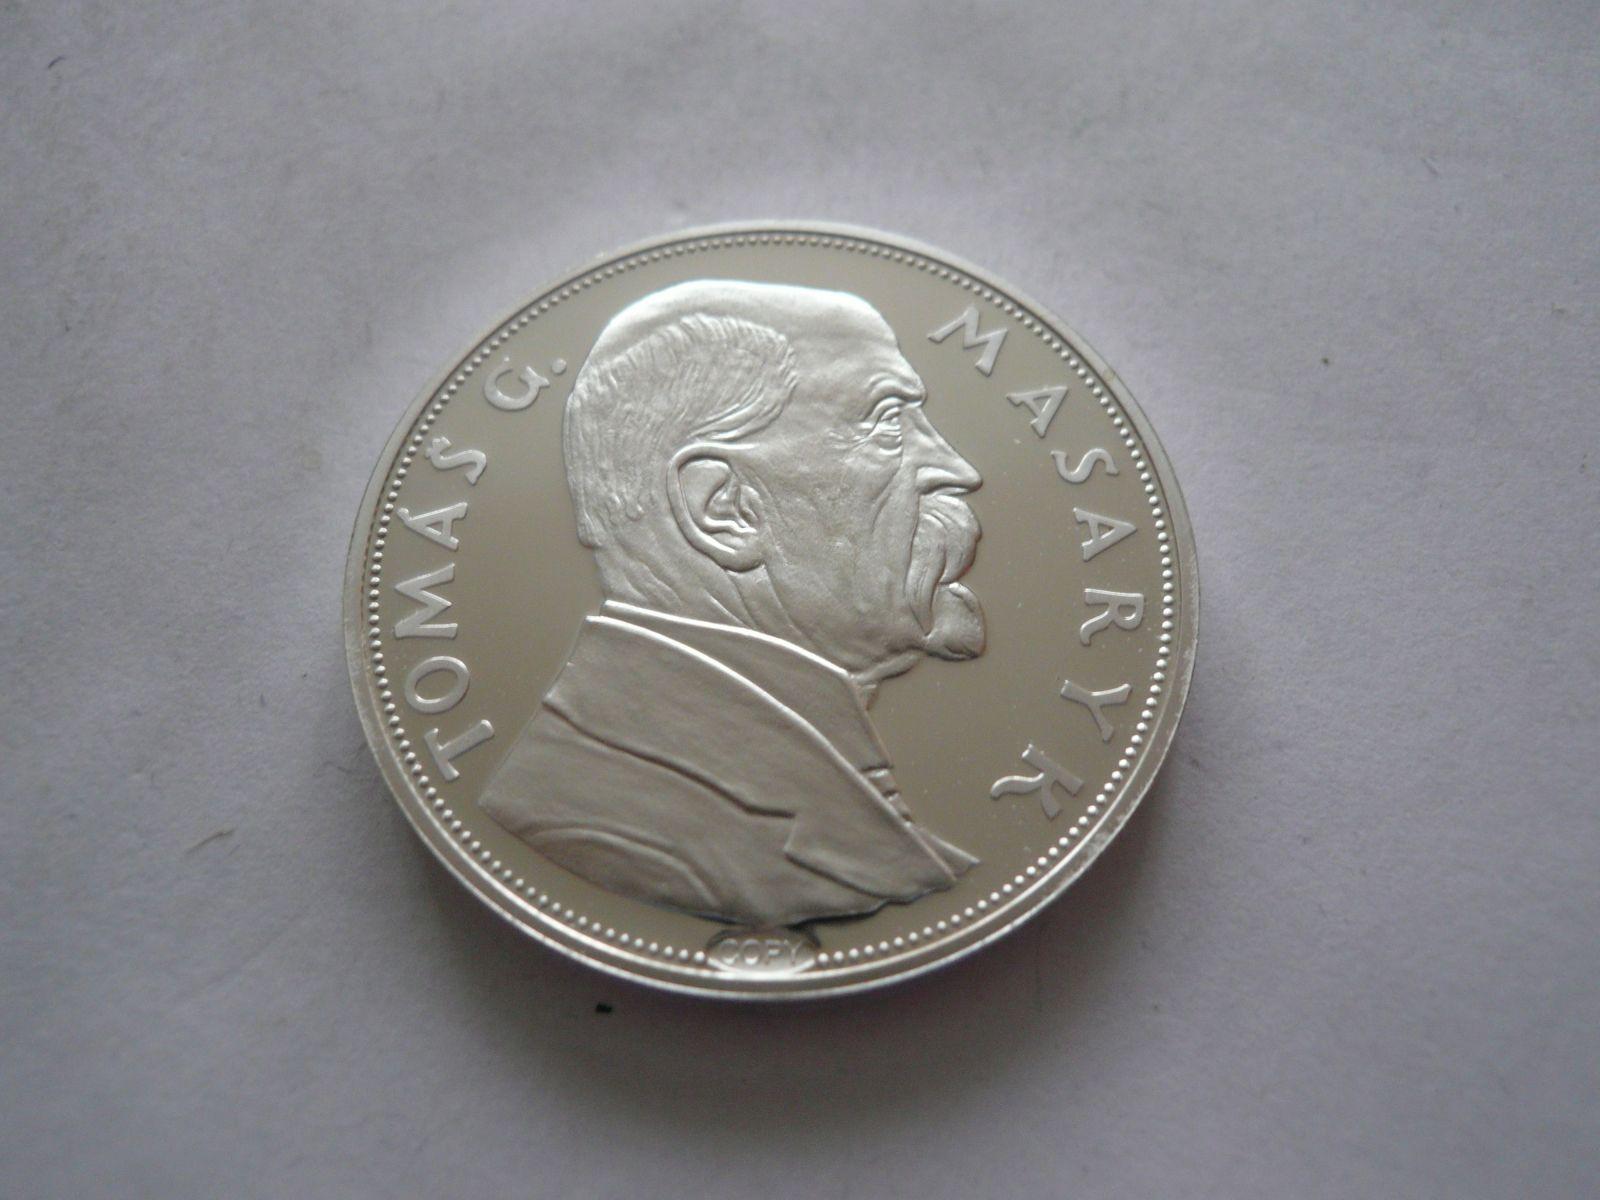 10 Kč portrét TGM, 1928, ČSR